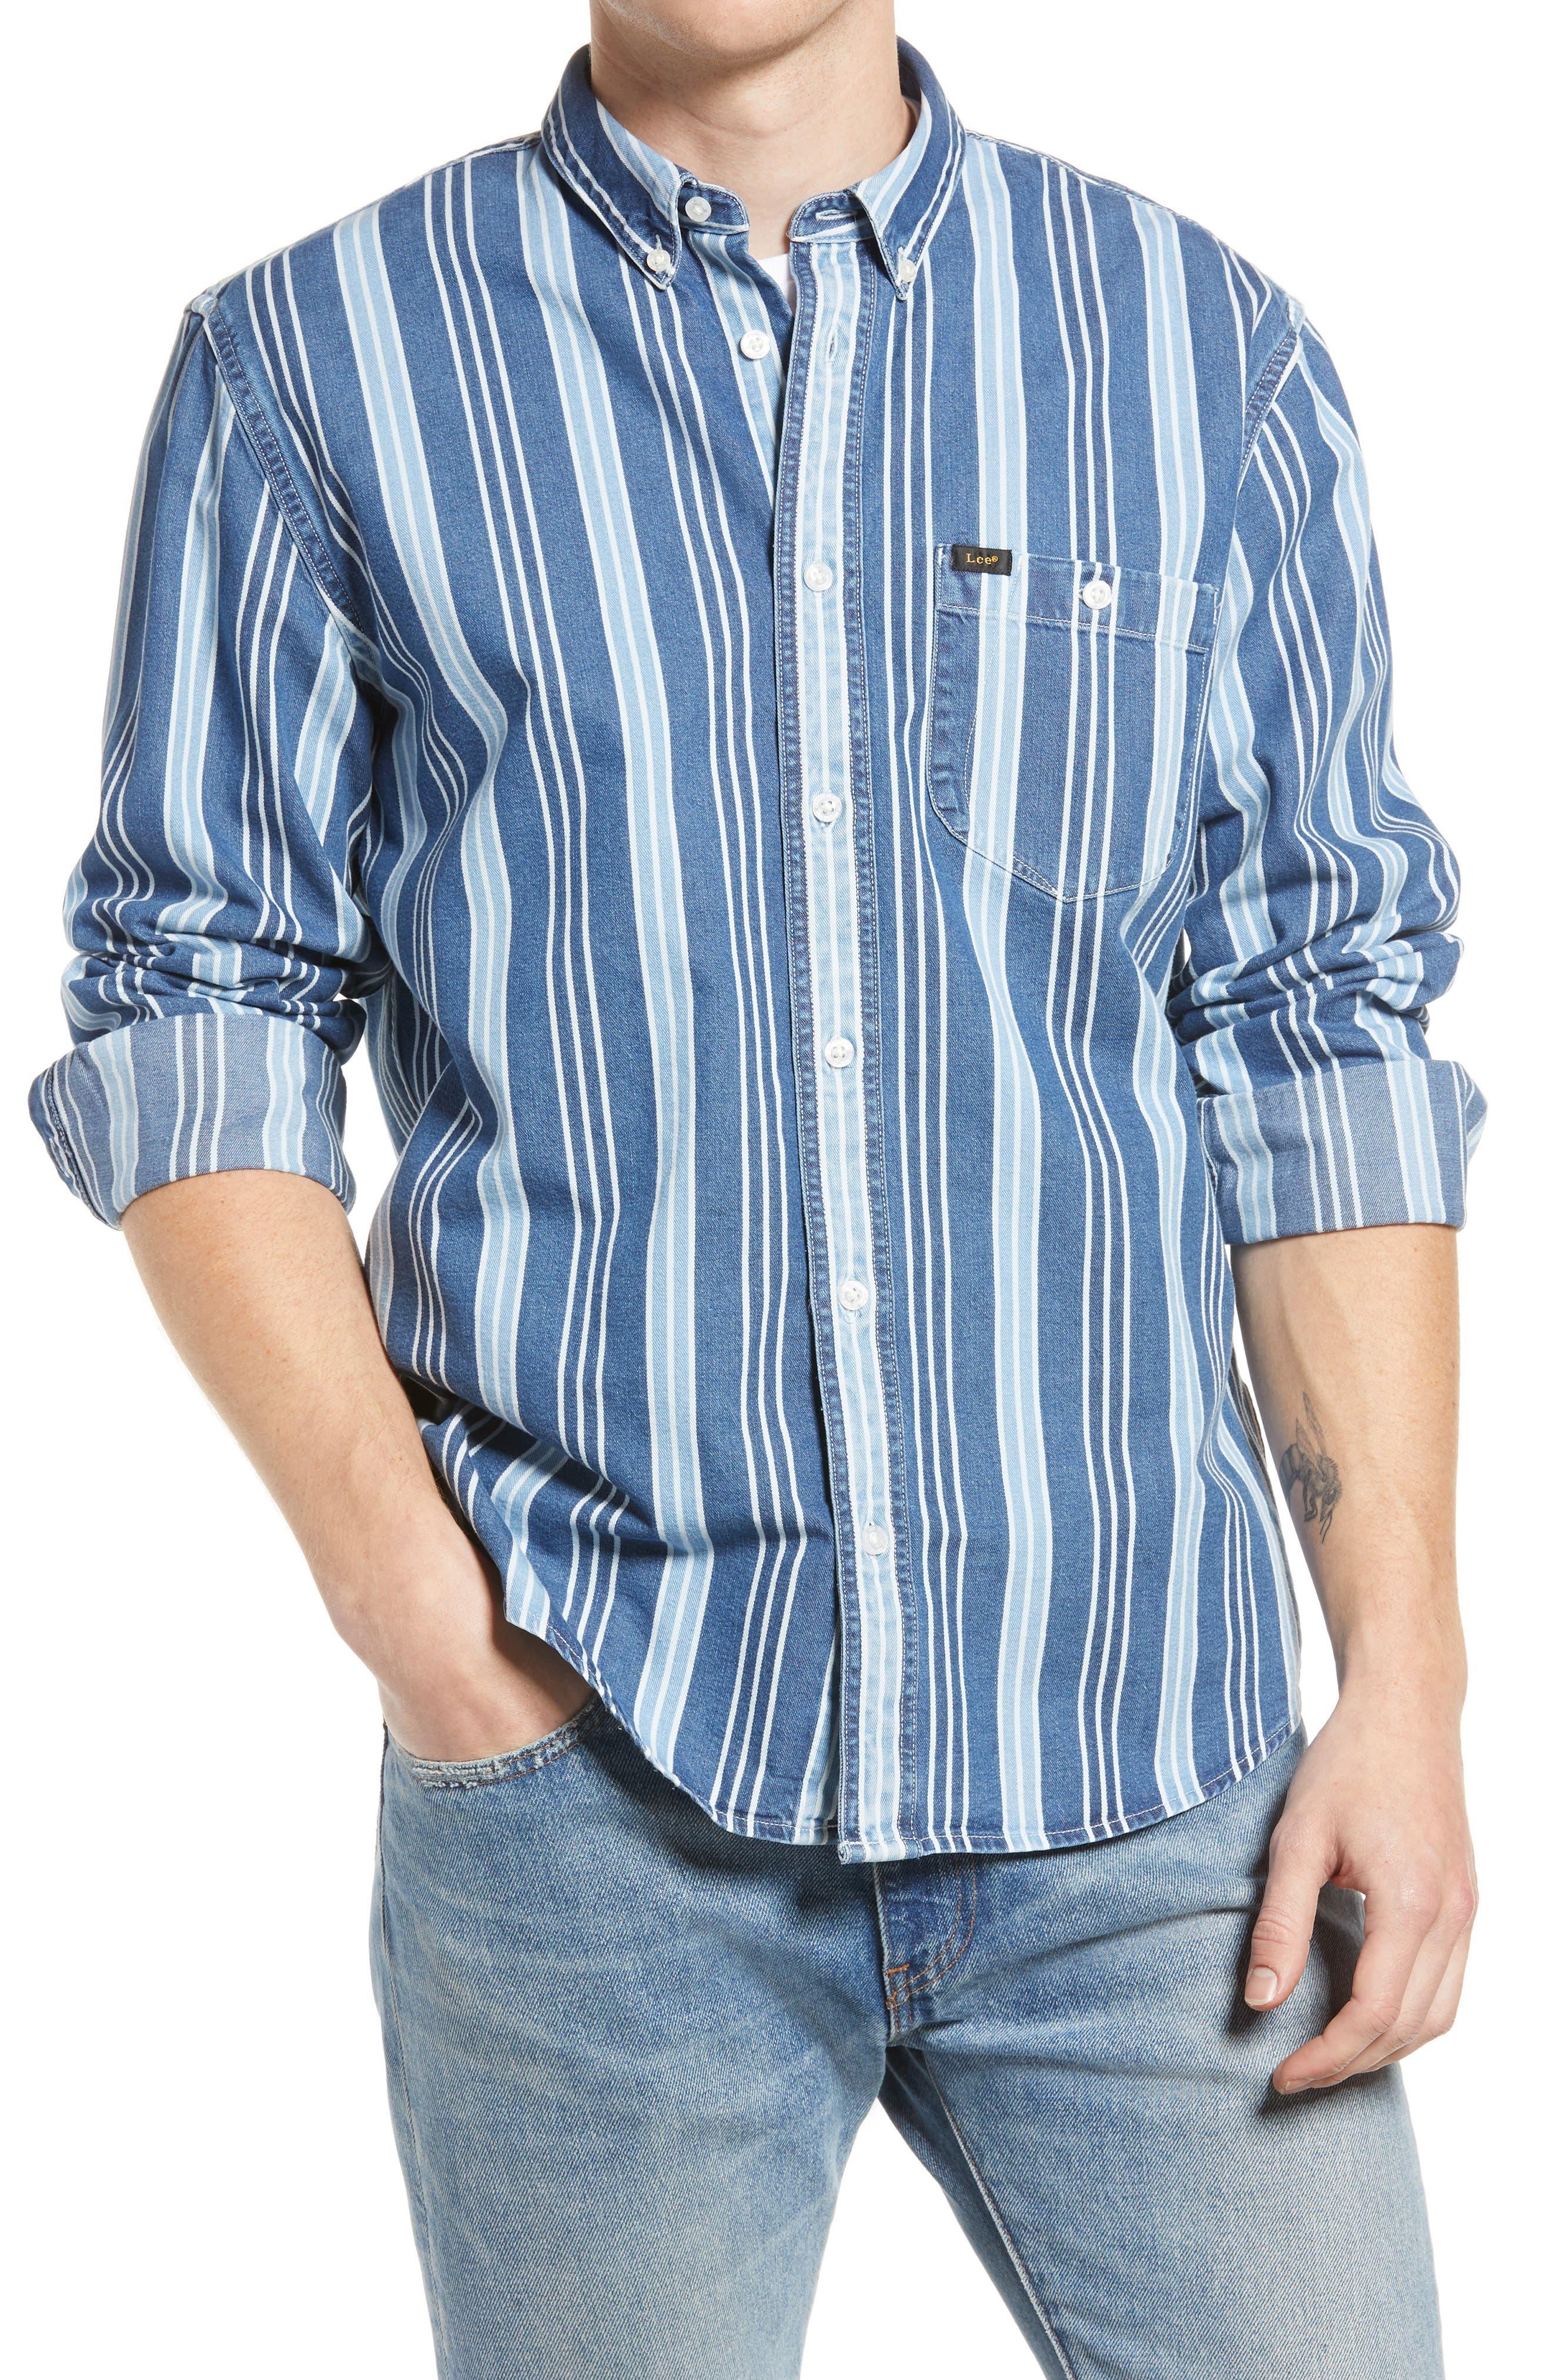 Regular Fit Riveted Stripe Button-Down Shirt